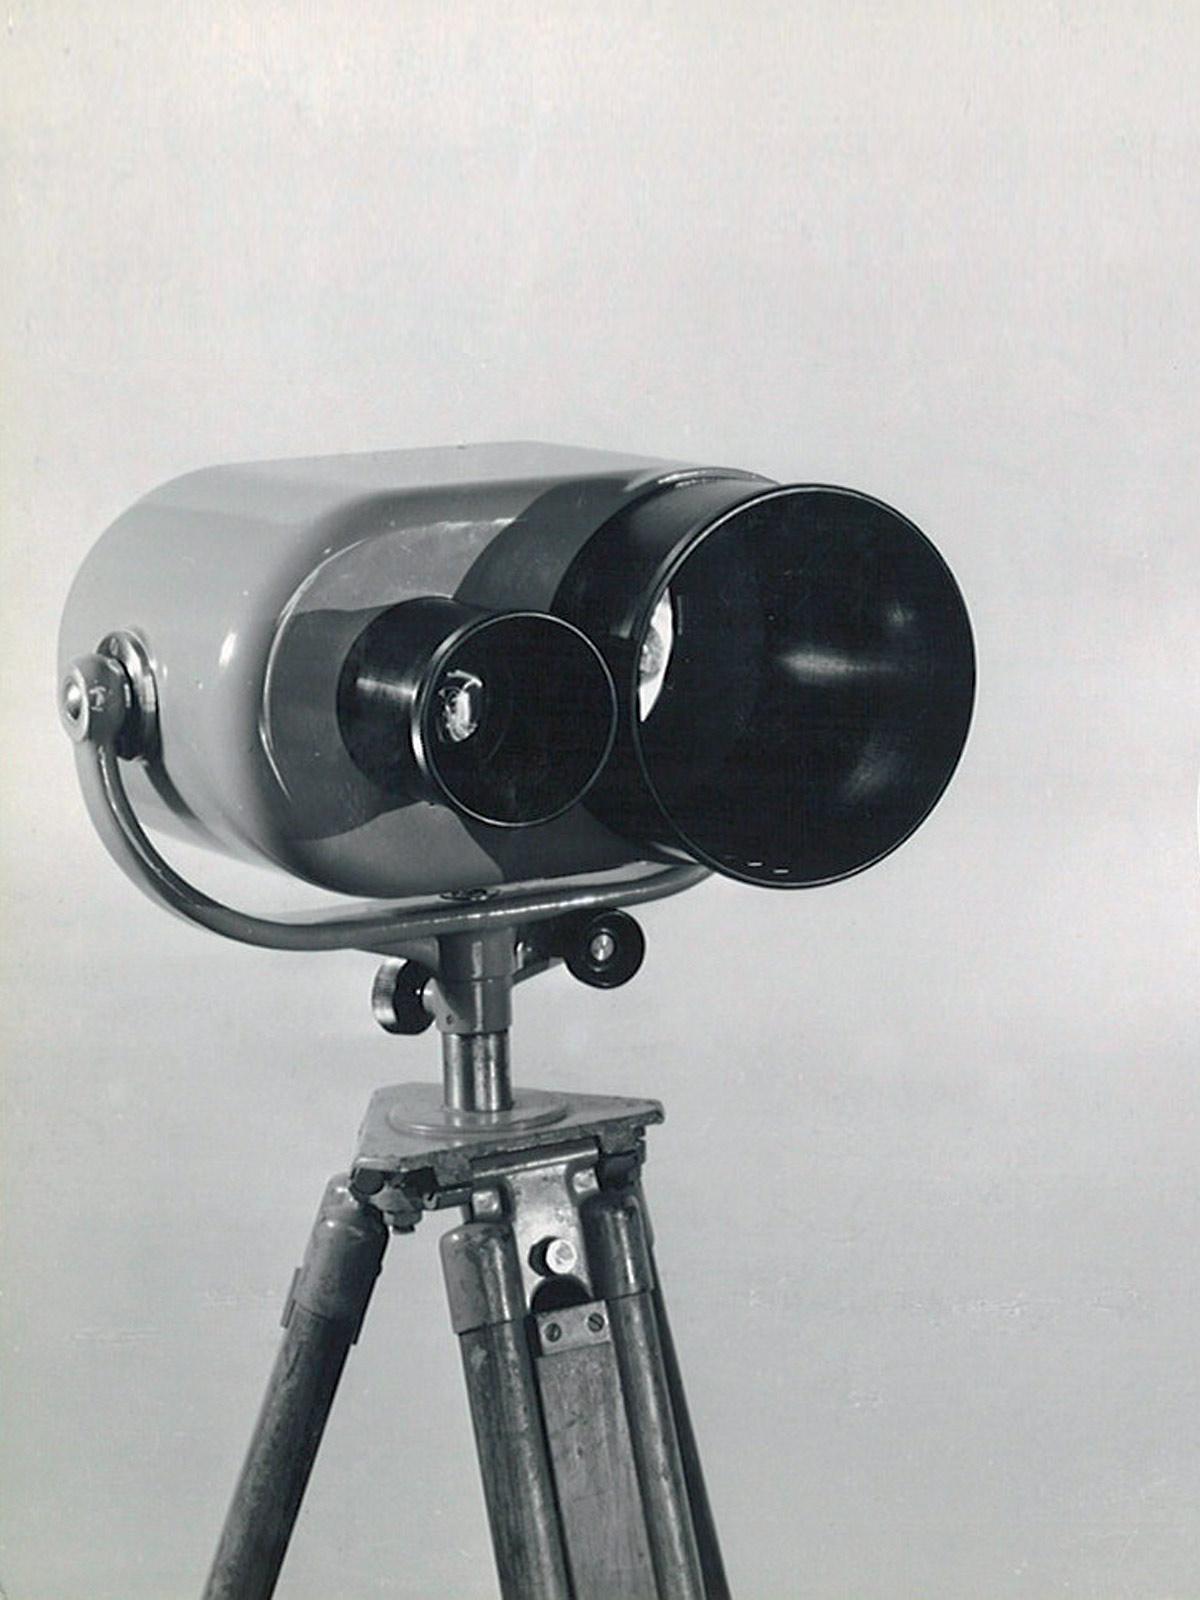 Kliknite za sliku za veću verziju  Ime:olympics_1948_photoelectric_1200x1600_large.jpg Viđeno:381 Veličina:220,5 KB ID:130398